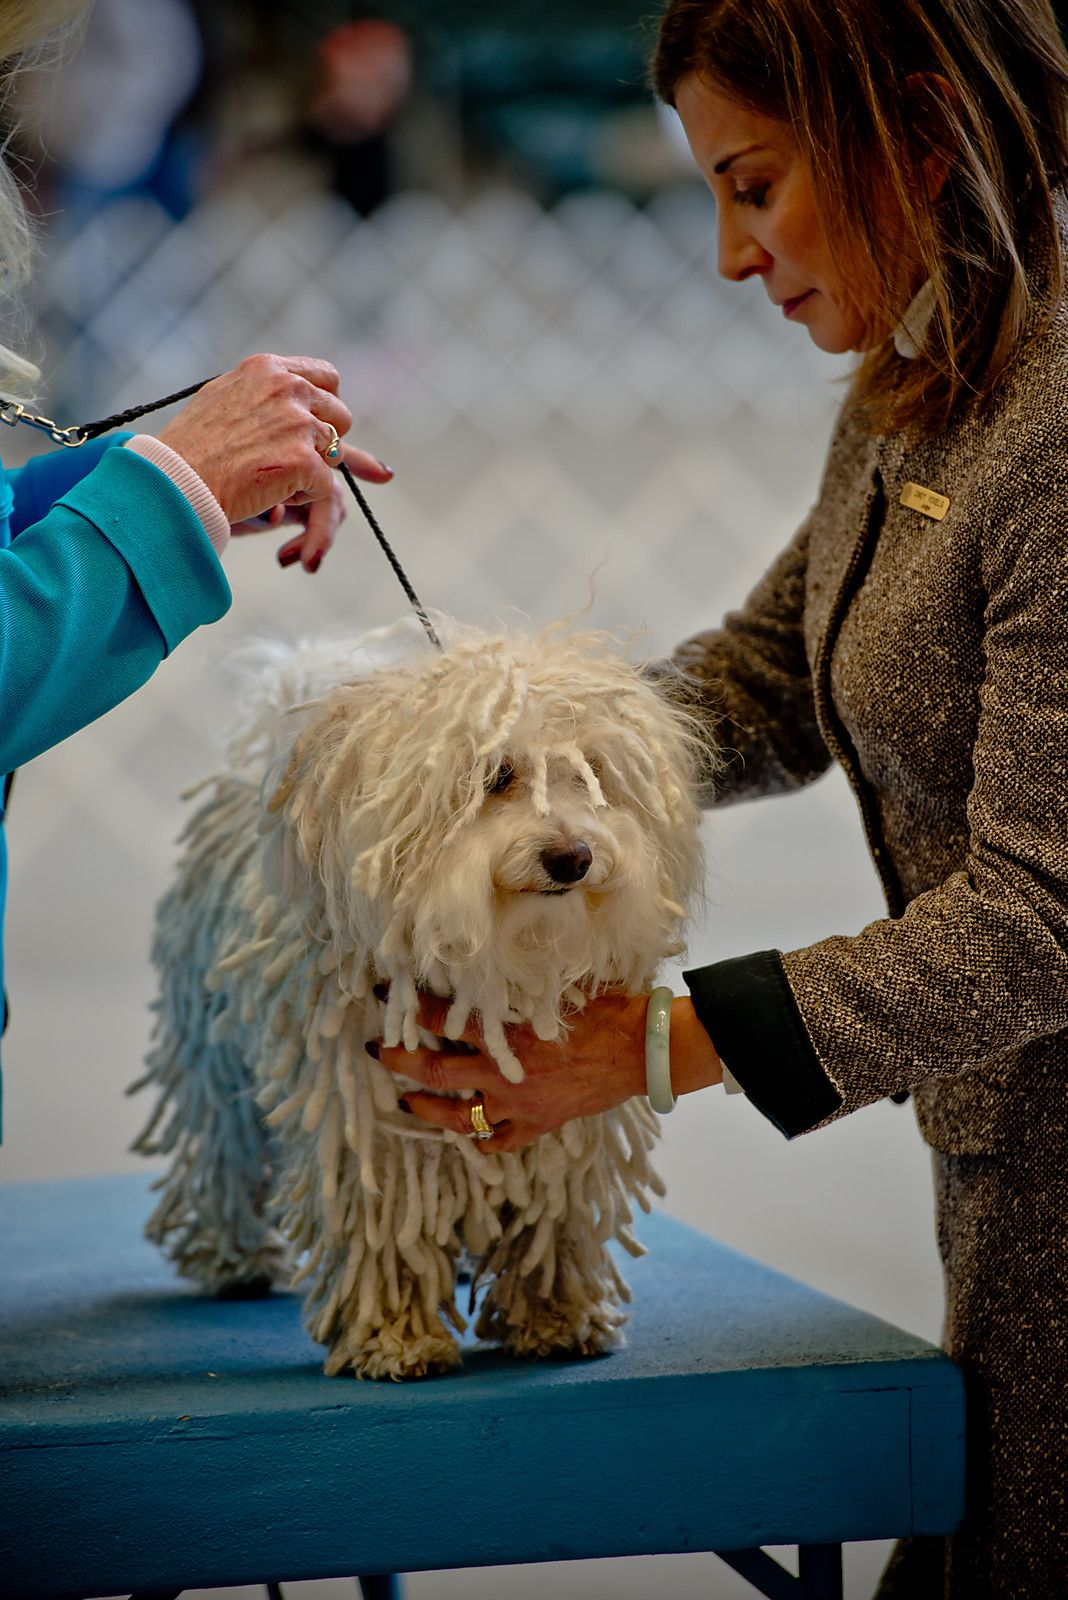 Craigslist In Des Moines Ia Pets For Sale - Wayang Pets